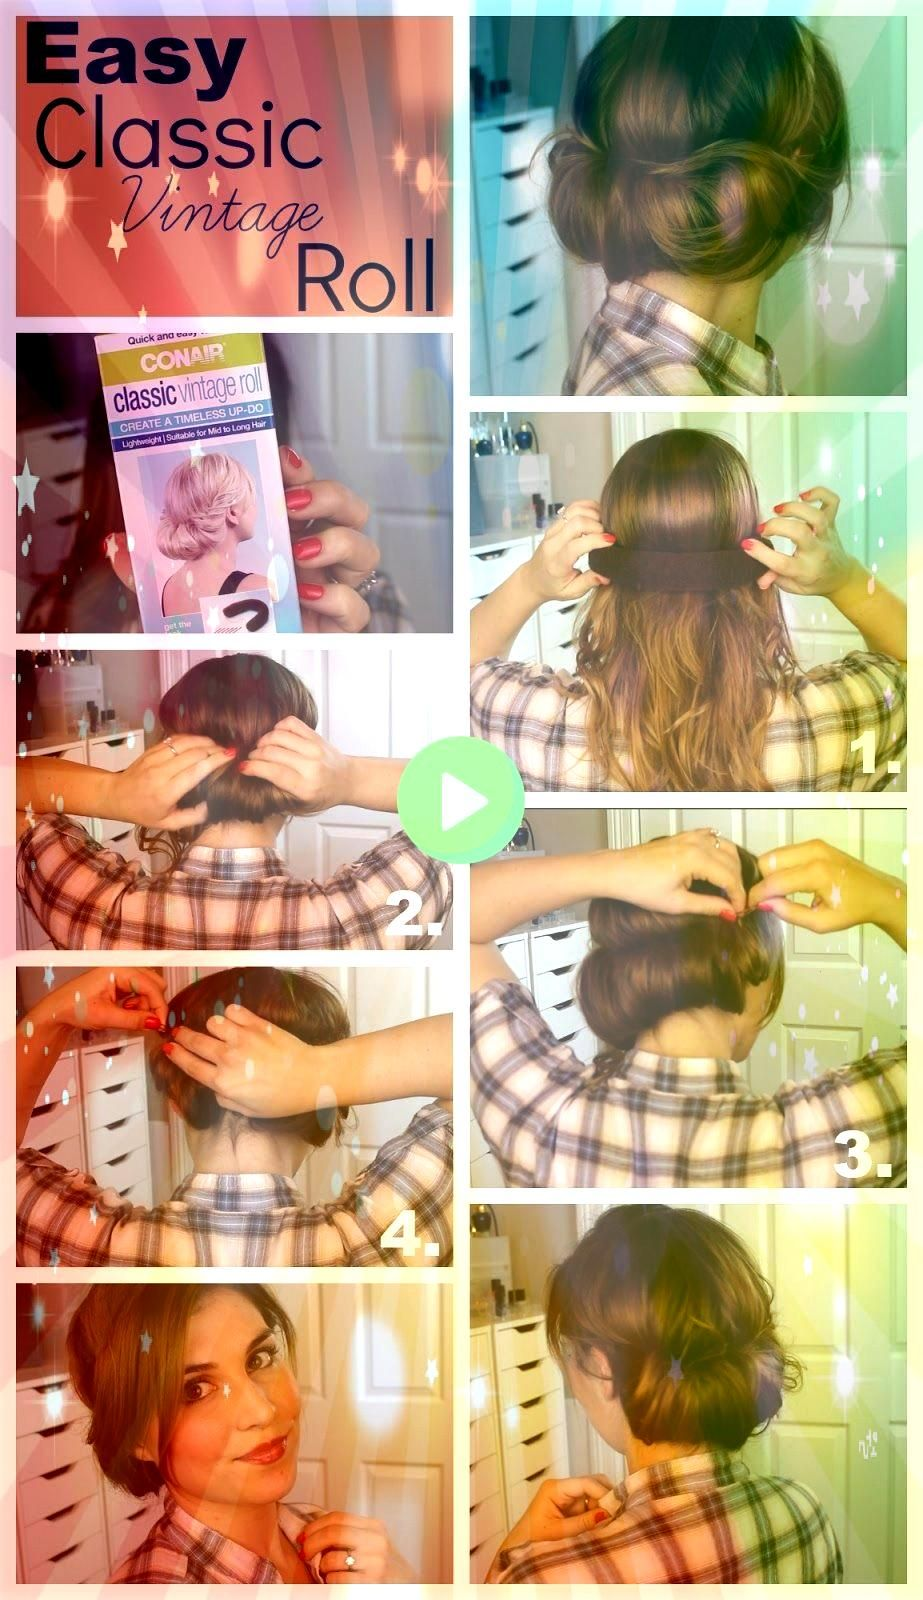 Sumptuous Side Simple Vintage Hairstyles Haircuts To Please Any Taste  17 Sumptuous Side Simple Vintage Hairstyles Haircuts To Please Any Taste   Best 20 Short Vintage Ha...